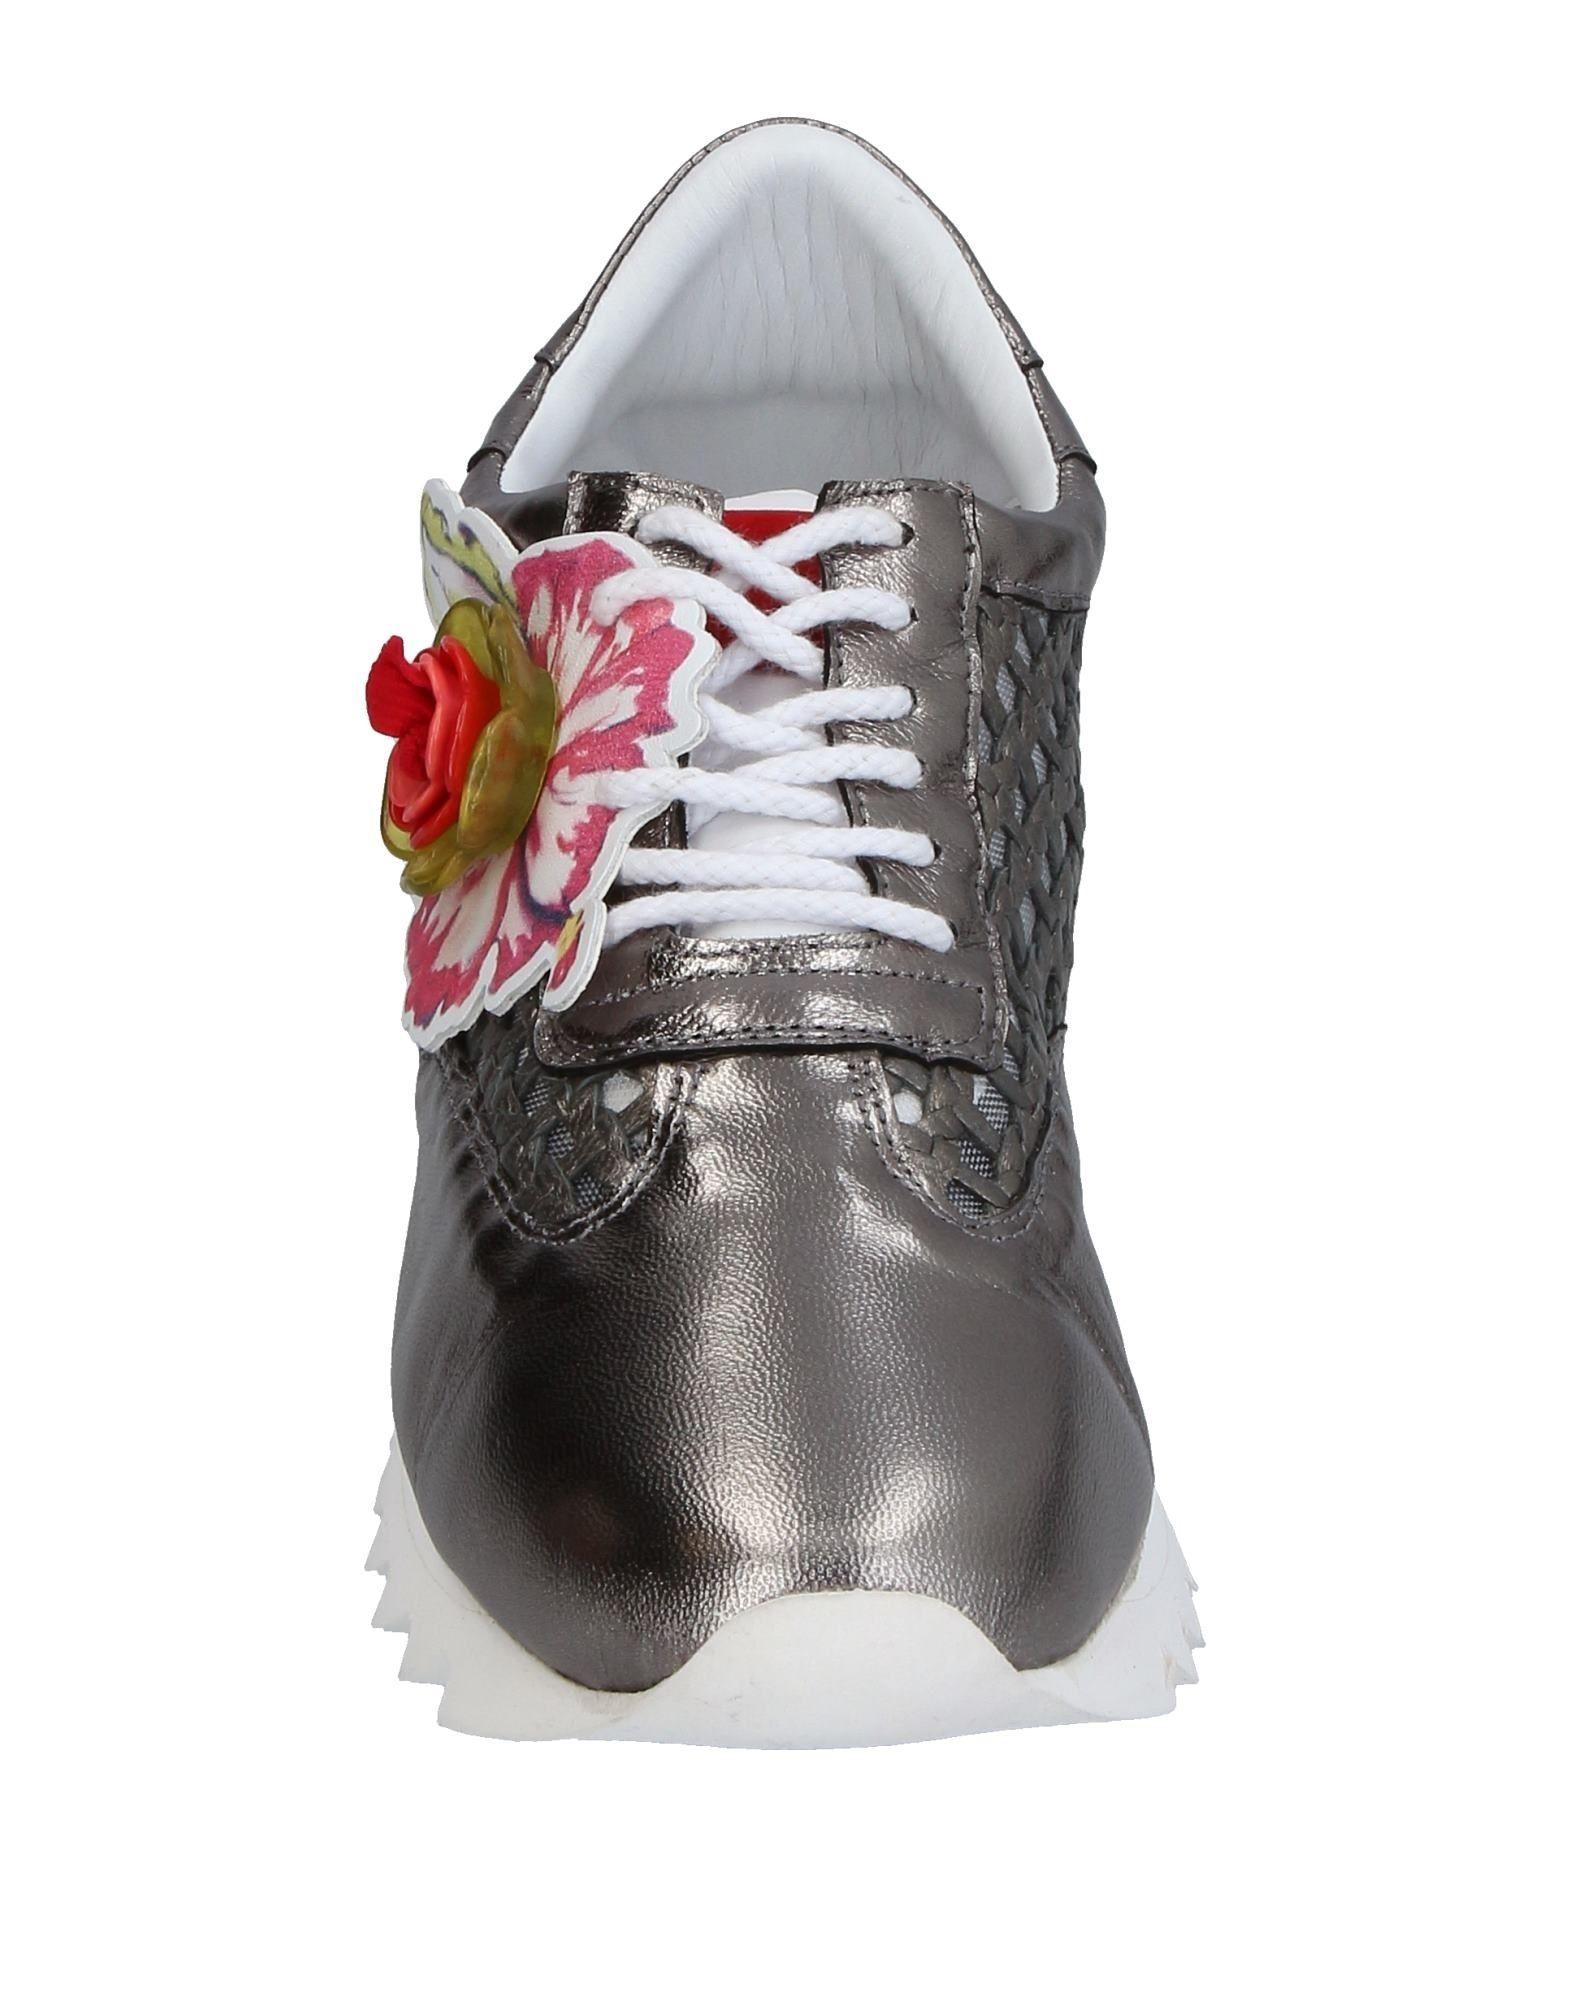 Sneakers Camuzares Femme - Sneakers Camuzares sur